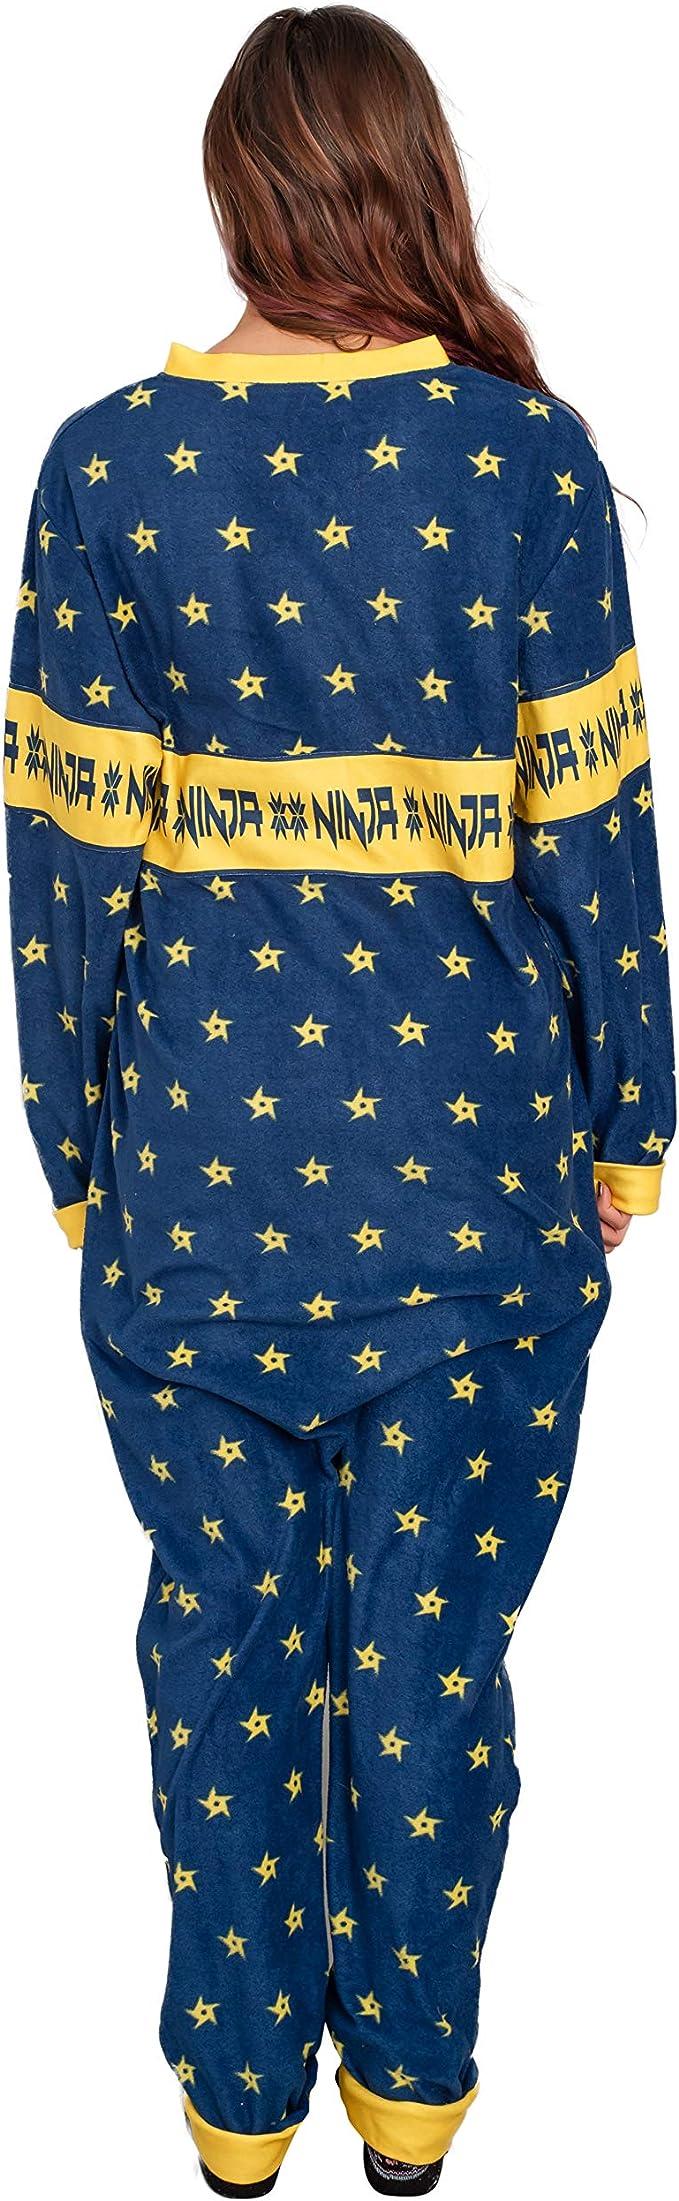 Amazon.com: Ninja Video Game Streamer Shurikens Pajama Union ...